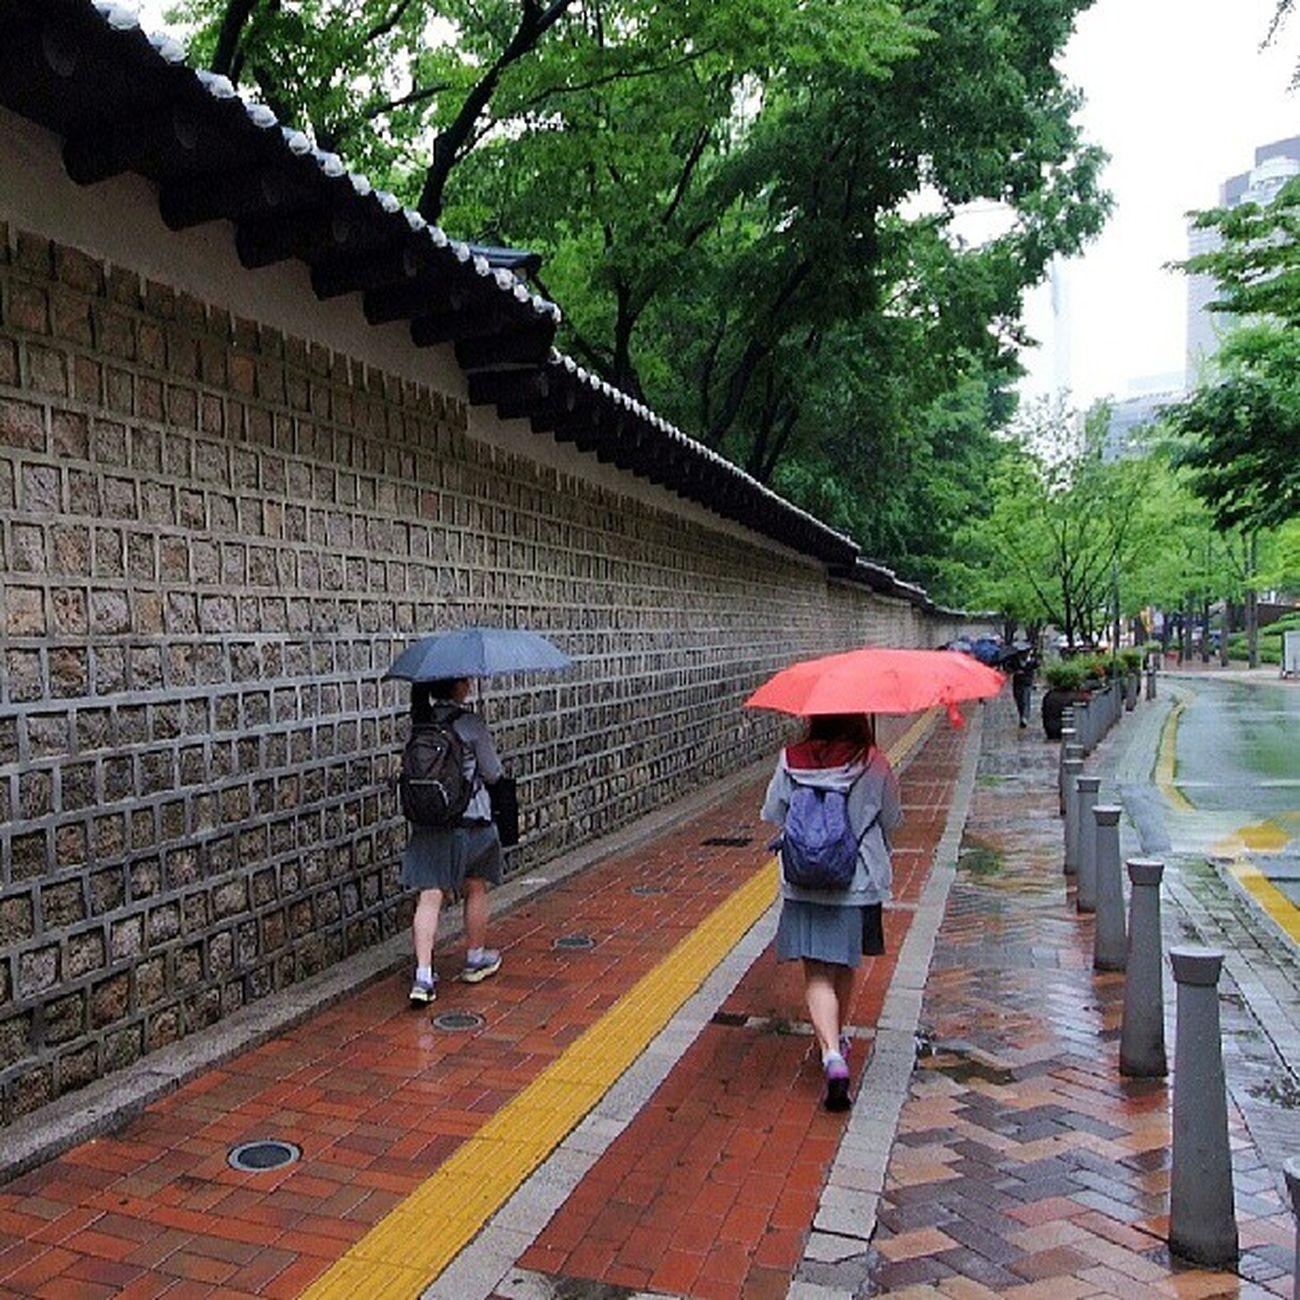 Robin_theme15 City of rain 오늘도 어김없이 빗소리나는 아침 굿모닝이에요 :) 정동